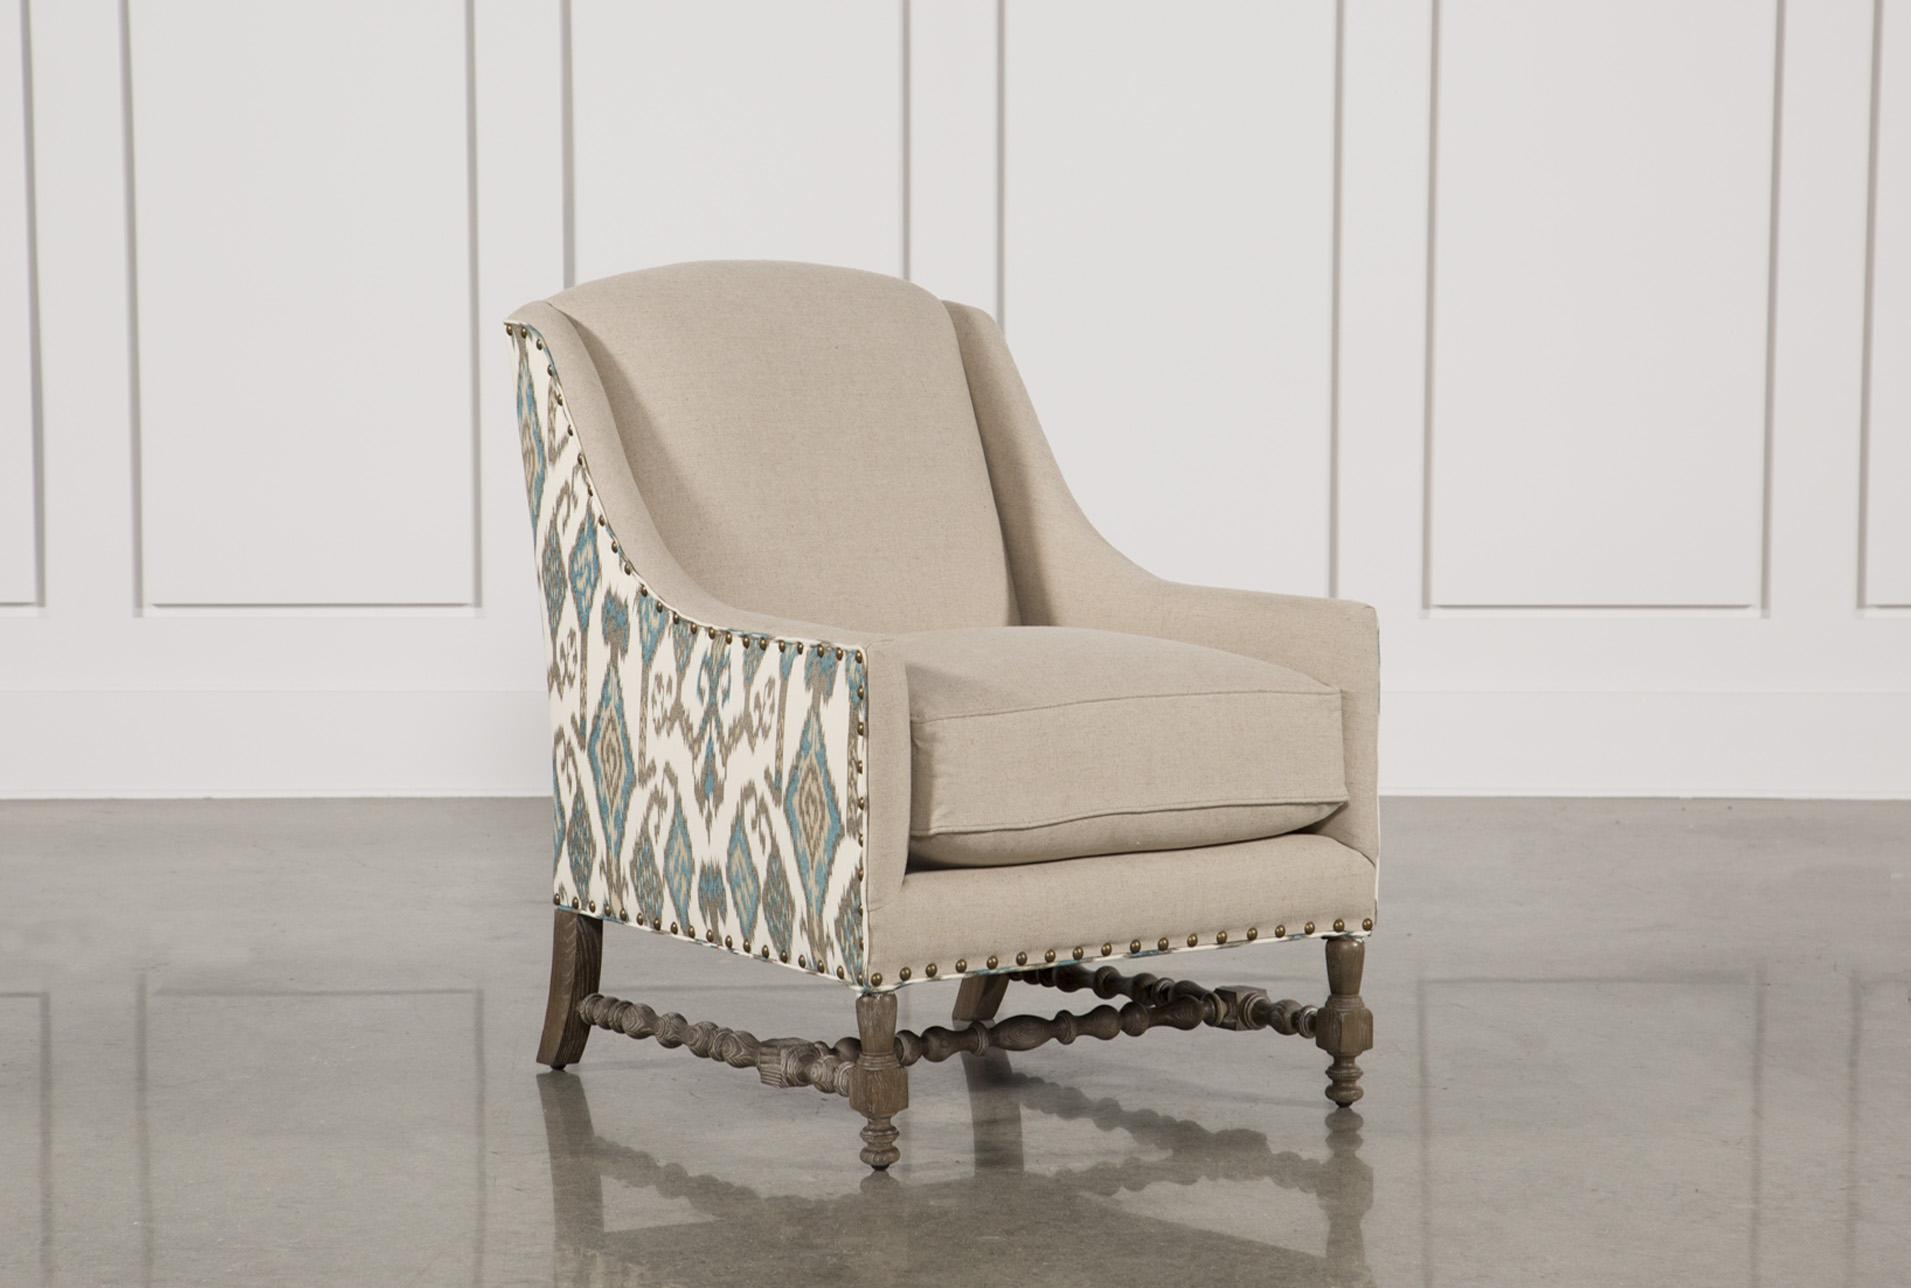 Teal Linen W/Nailheads Accent Chair   360